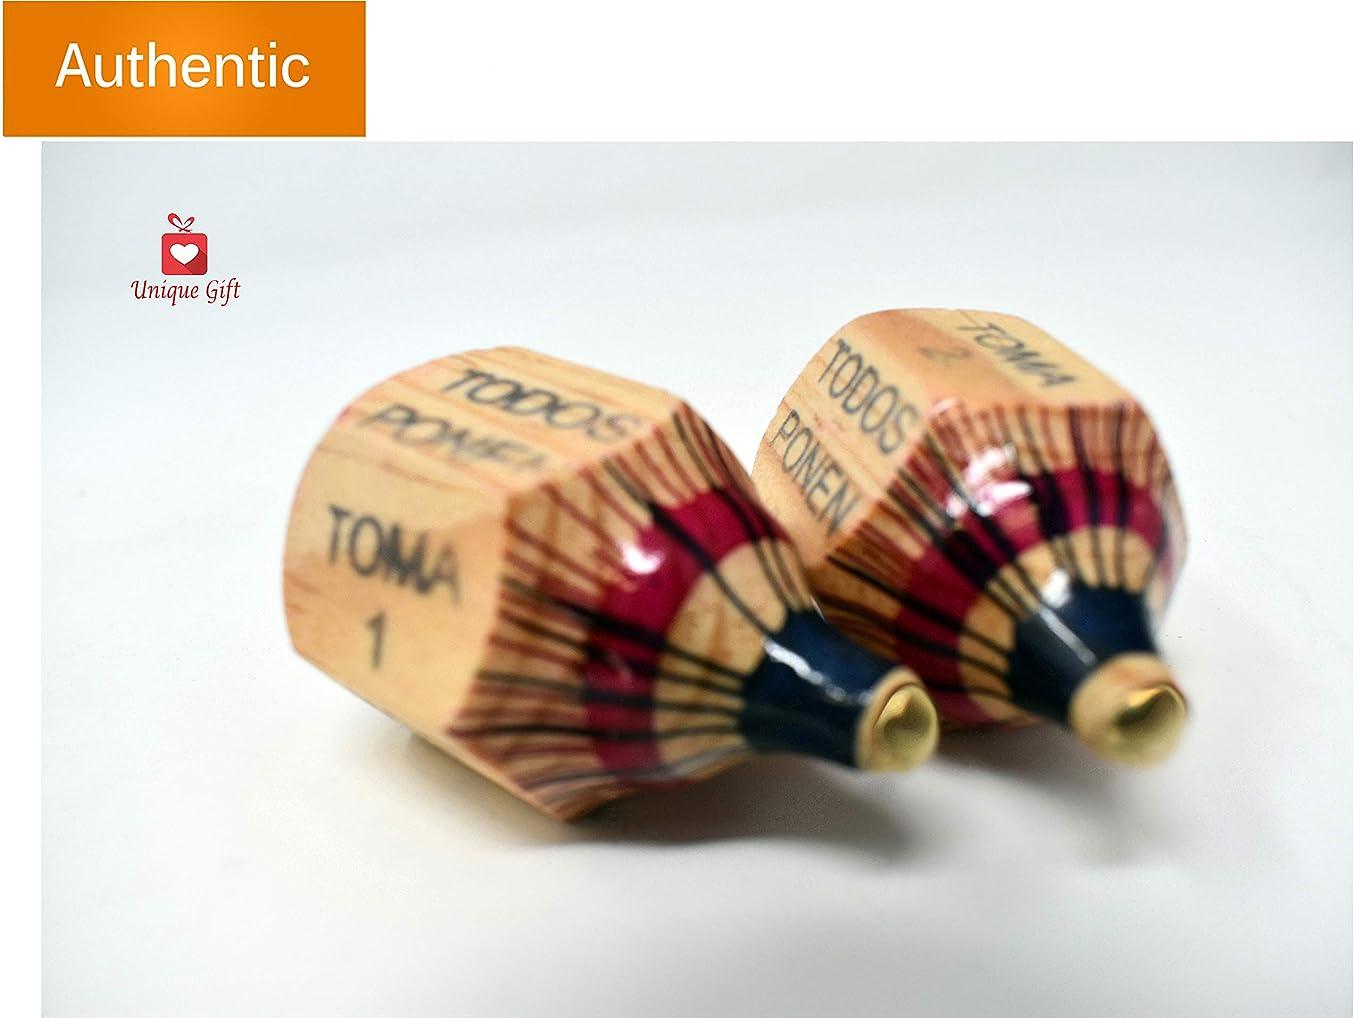 New | Alondra's Imports (TM) Uniquely Designed, Classic Wood Spinning Top Game (Pirinola Toma Todo - Artesania De Madera) Unique Assorted Color at Tip - Premium Quality Finish - Complete Set of 2